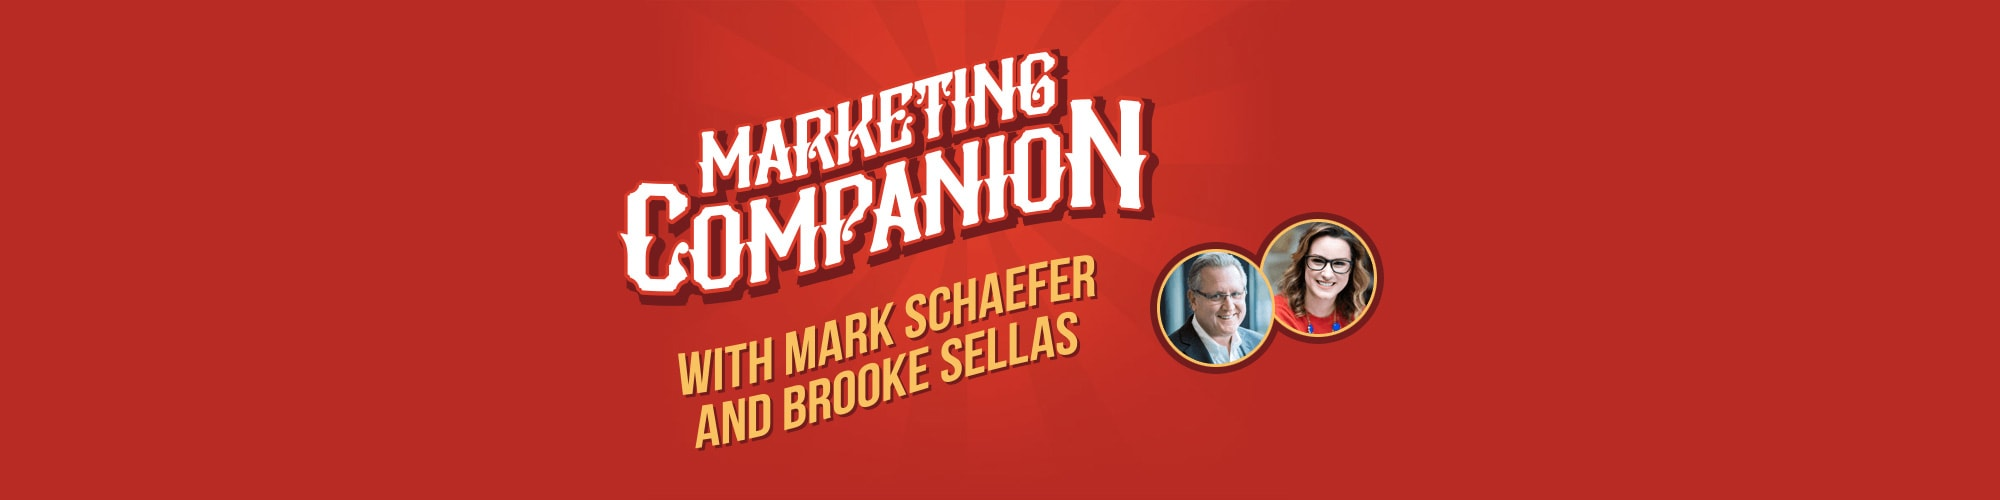 Marketing Companion with Mark Schaefer & Brooke Sellas